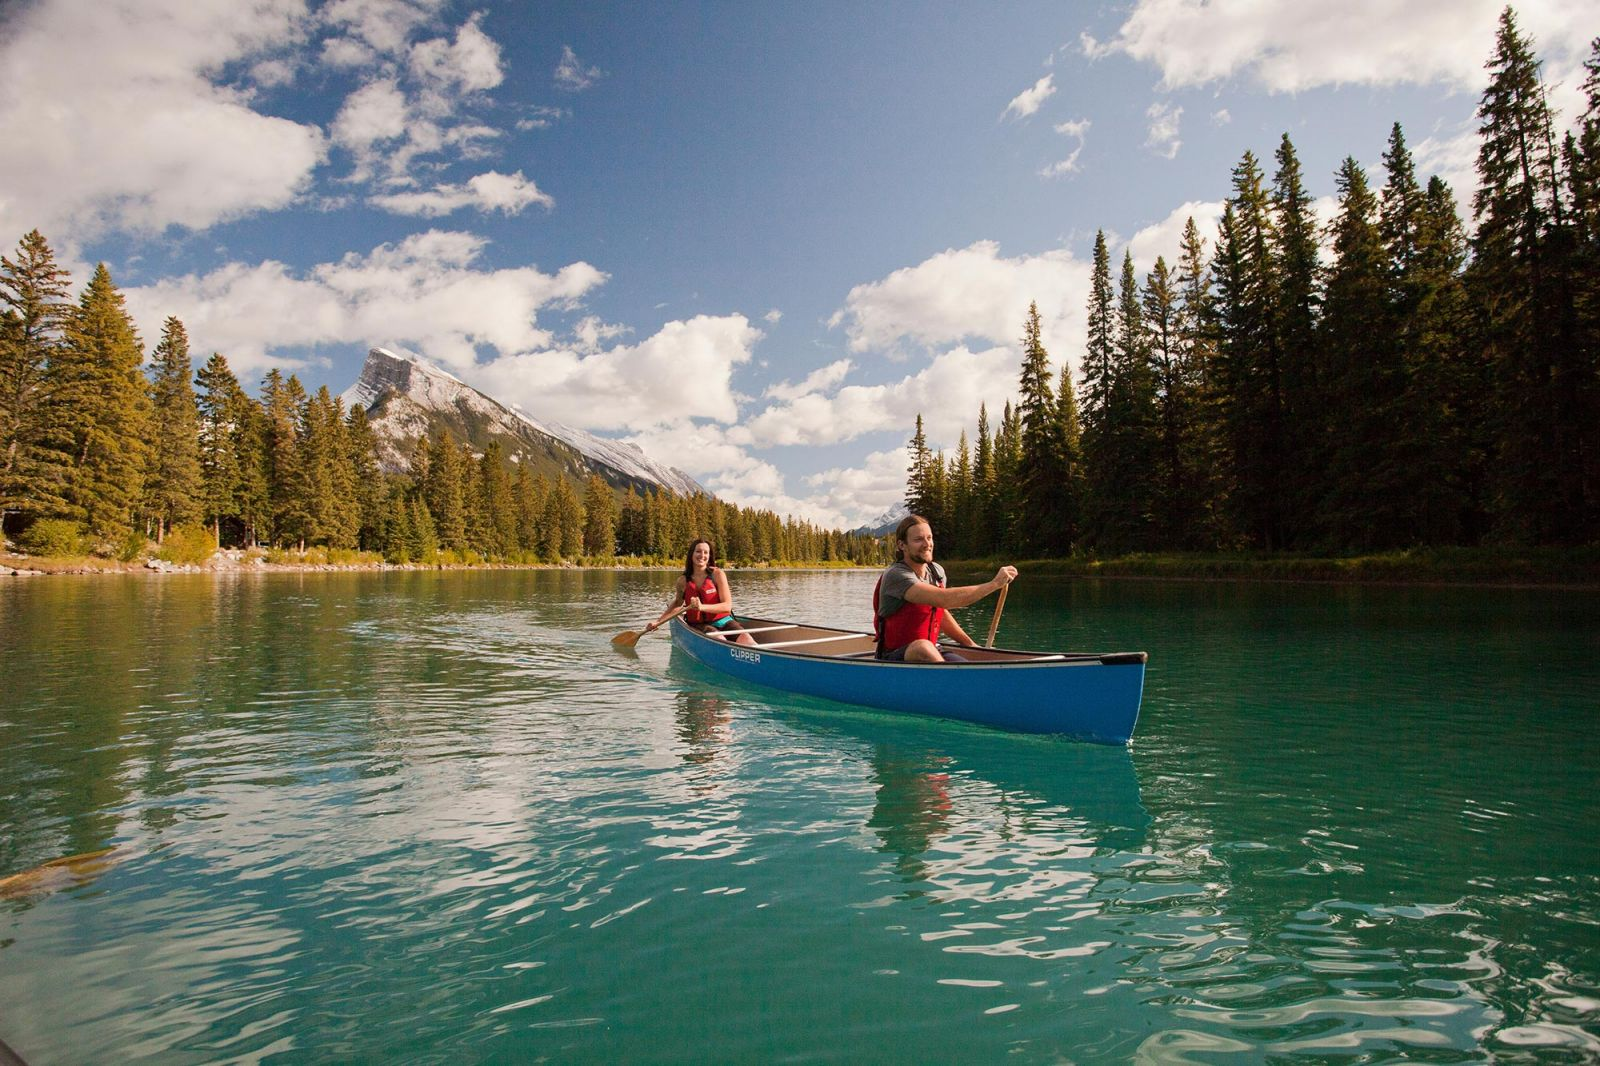 Canoeing in Banff, Alberta, Canada